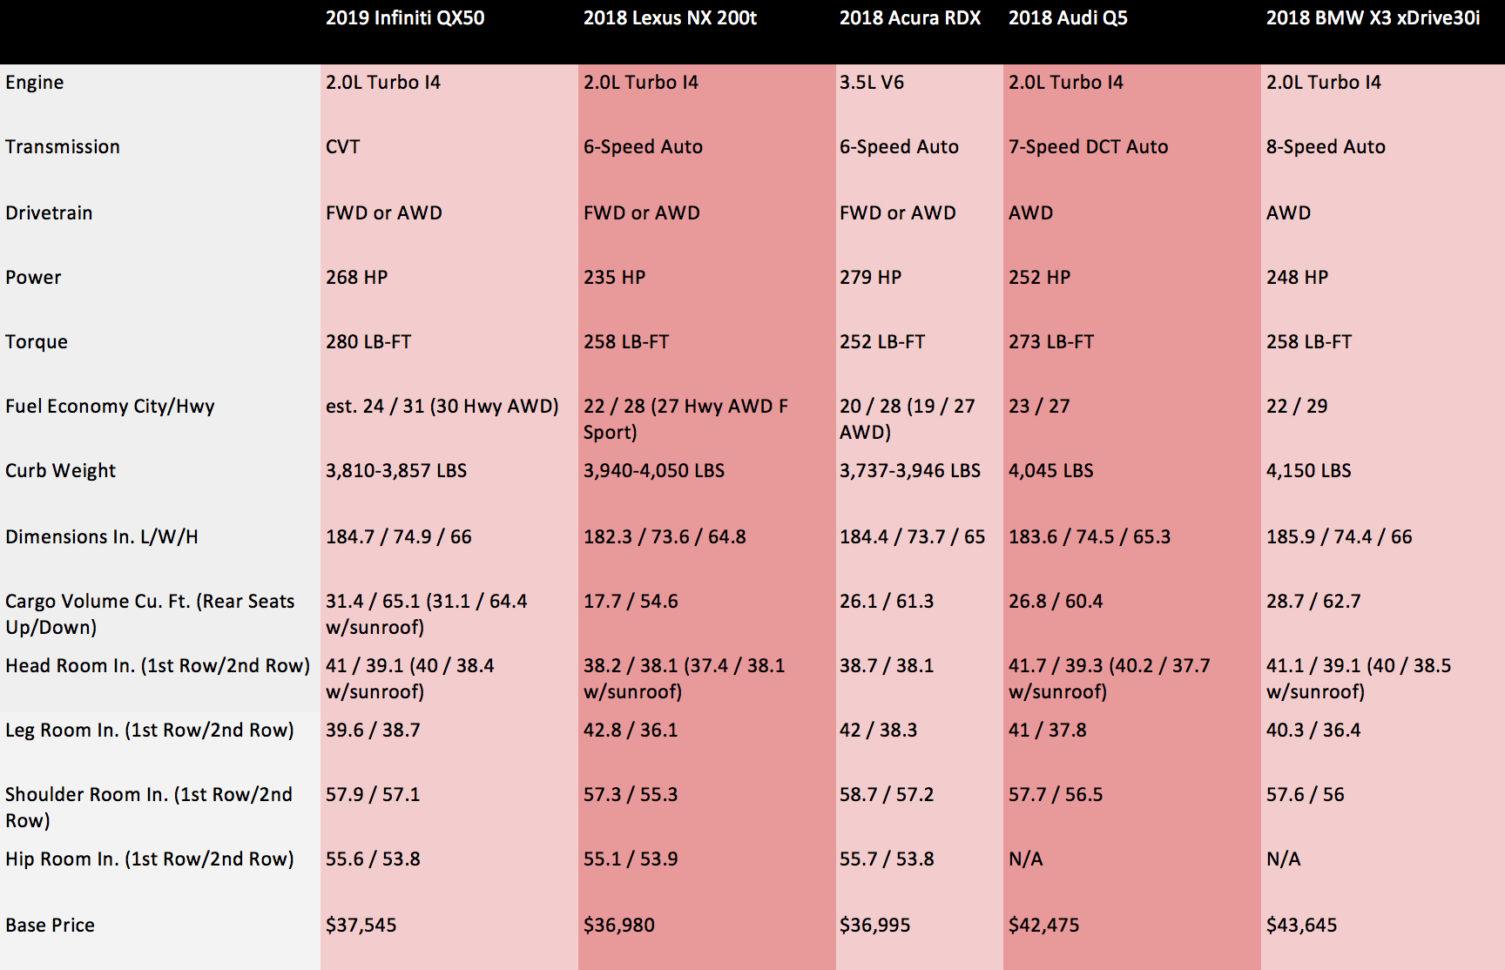 Suv Comparison Spreadsheet Pertaining To Comparing The 2019 Infiniti Qx50 Vs Lexus Nx Vs Acura Rdx Vs Audi Q5